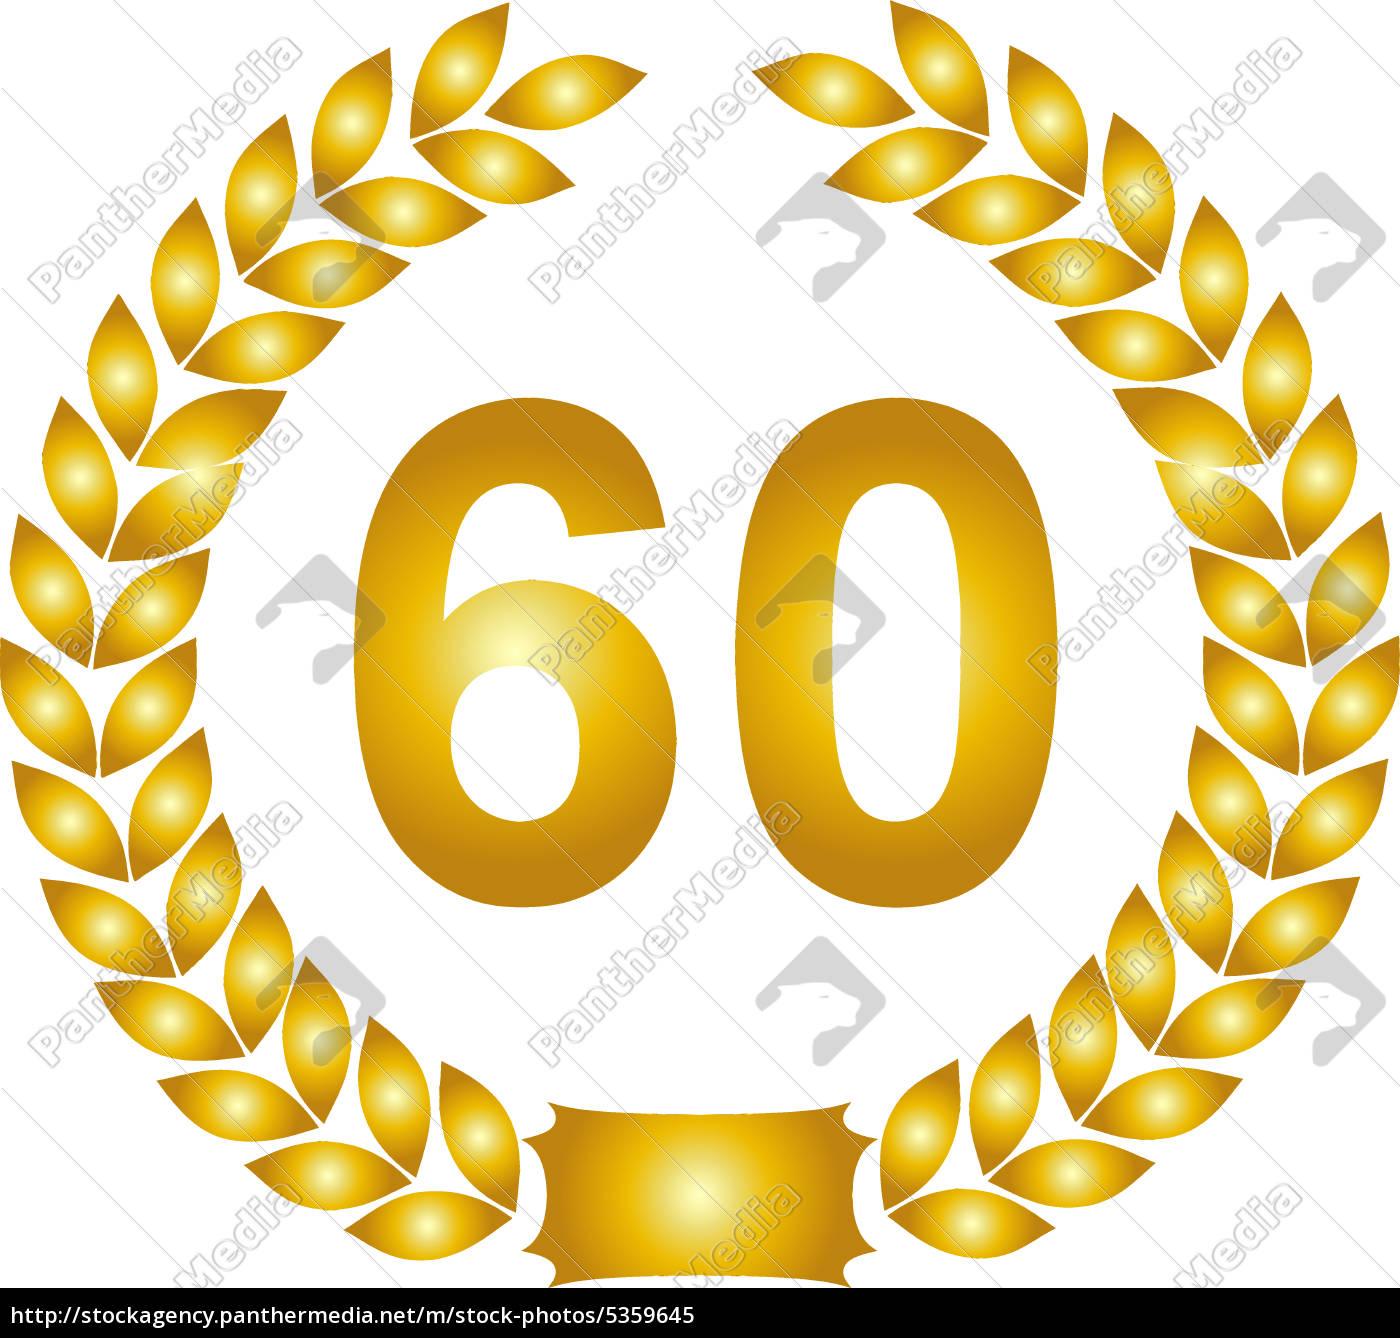 60 år gyldne laurbærkrans 60 år   Royalty Free Image   #5359645  60 år